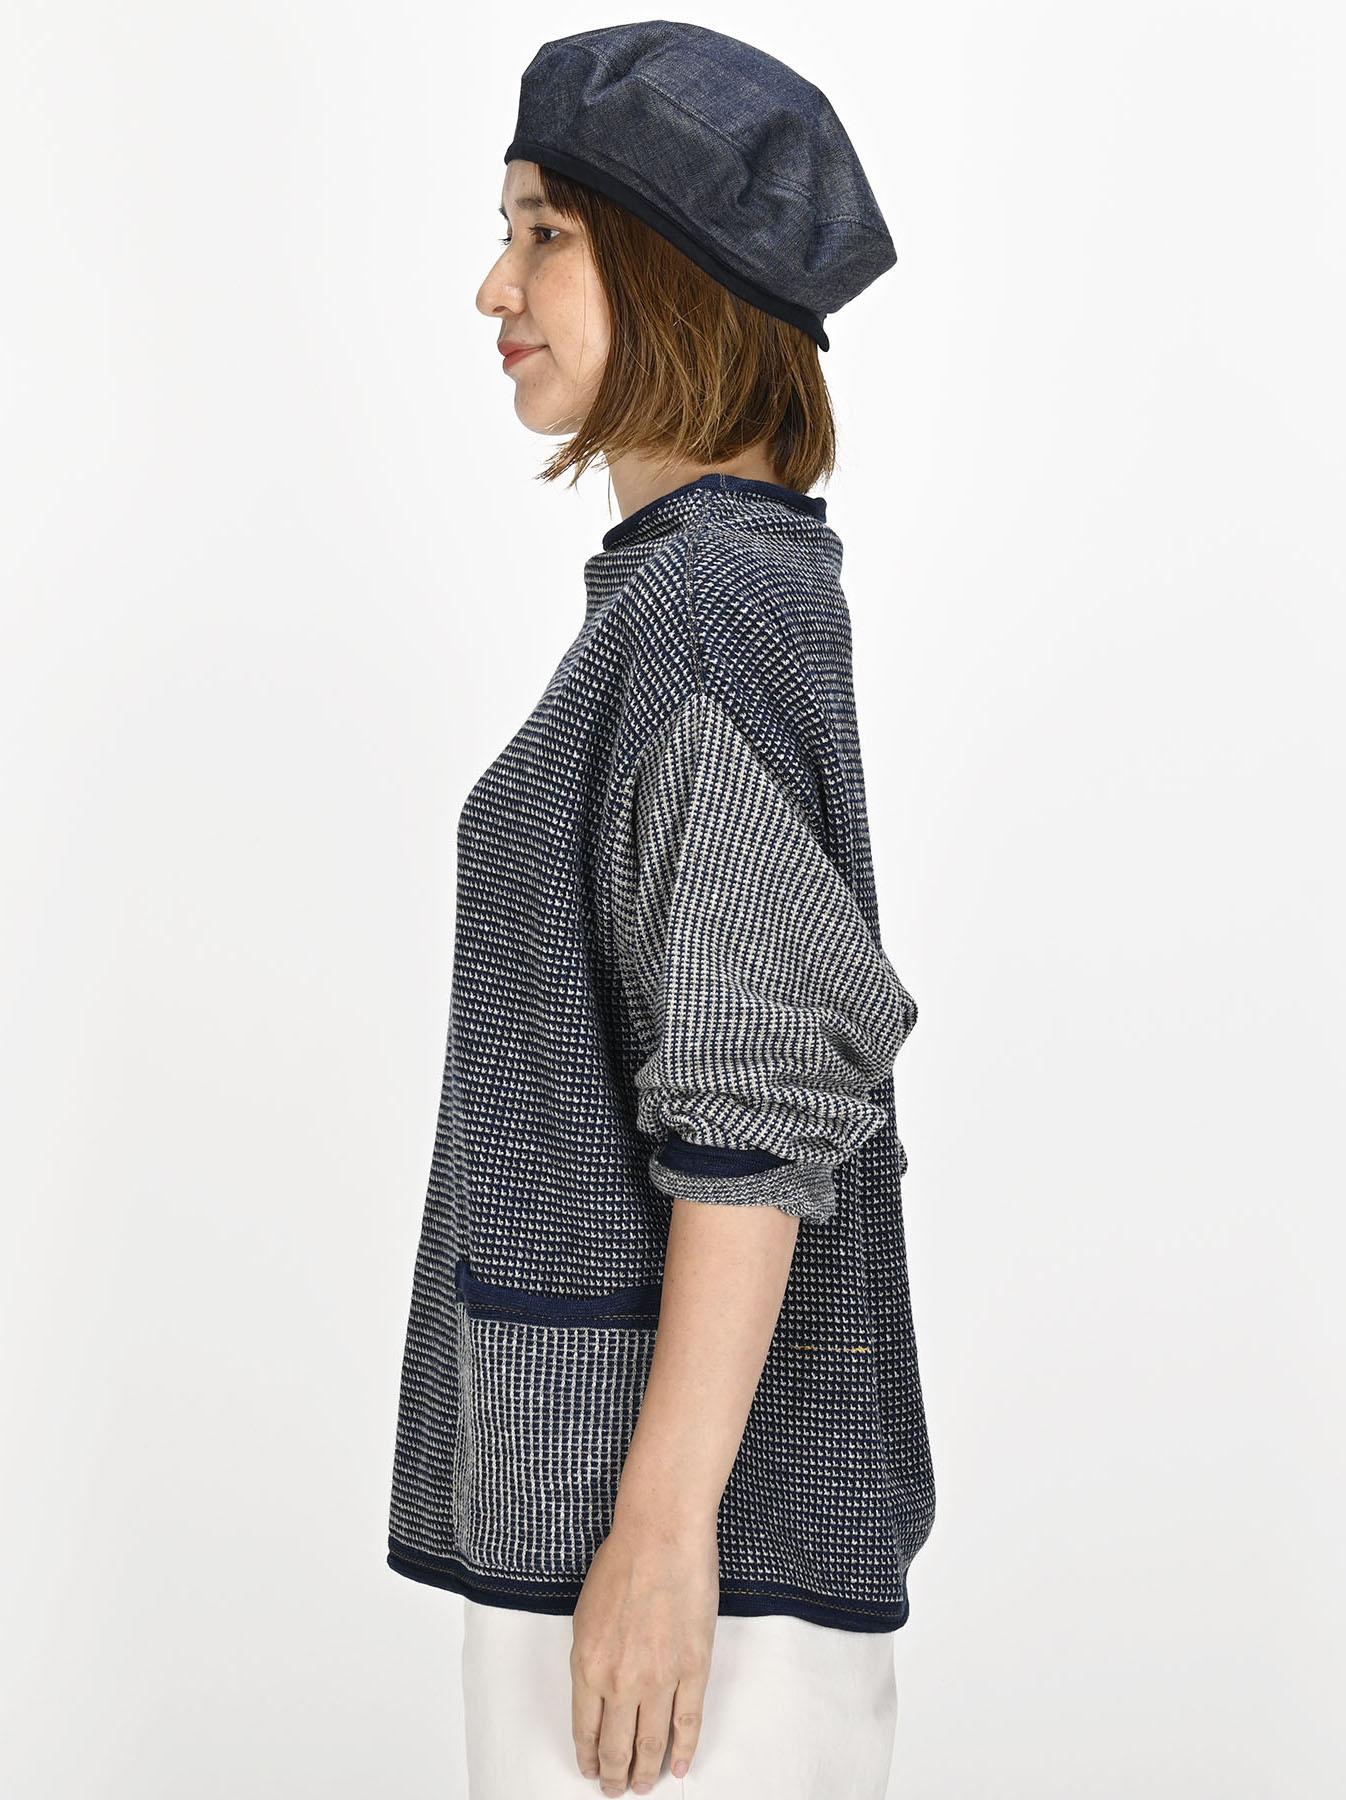 Indigo Tappet Kanoko Umahiko Sweater-3